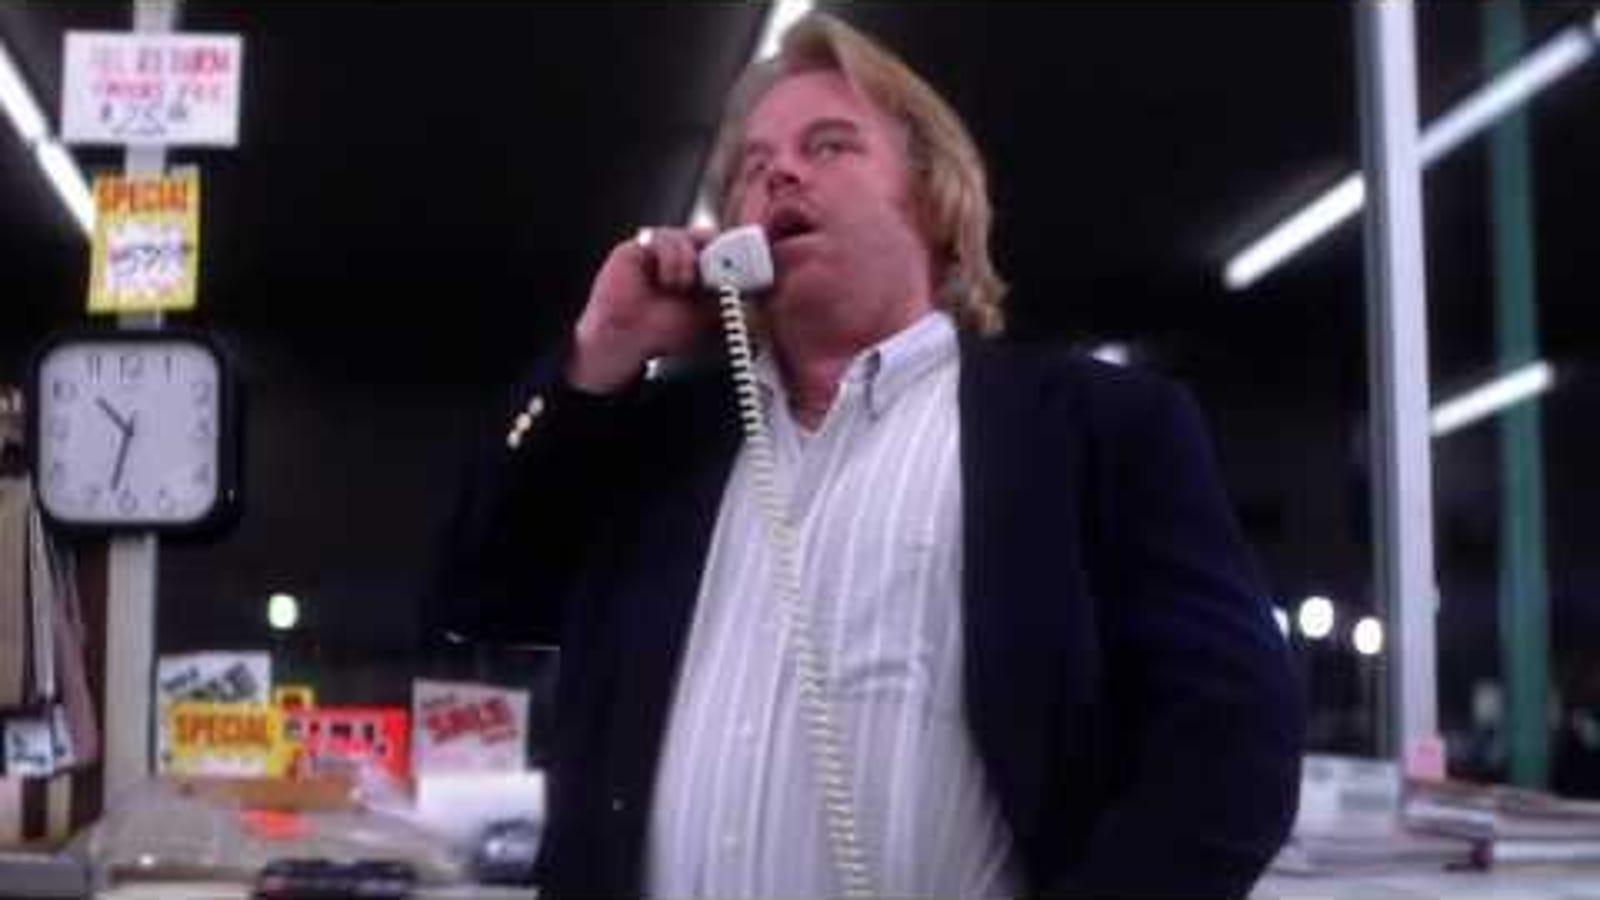 Punch-Drunk Love: Where Philip Seymour Hoffman Steals Every Scene